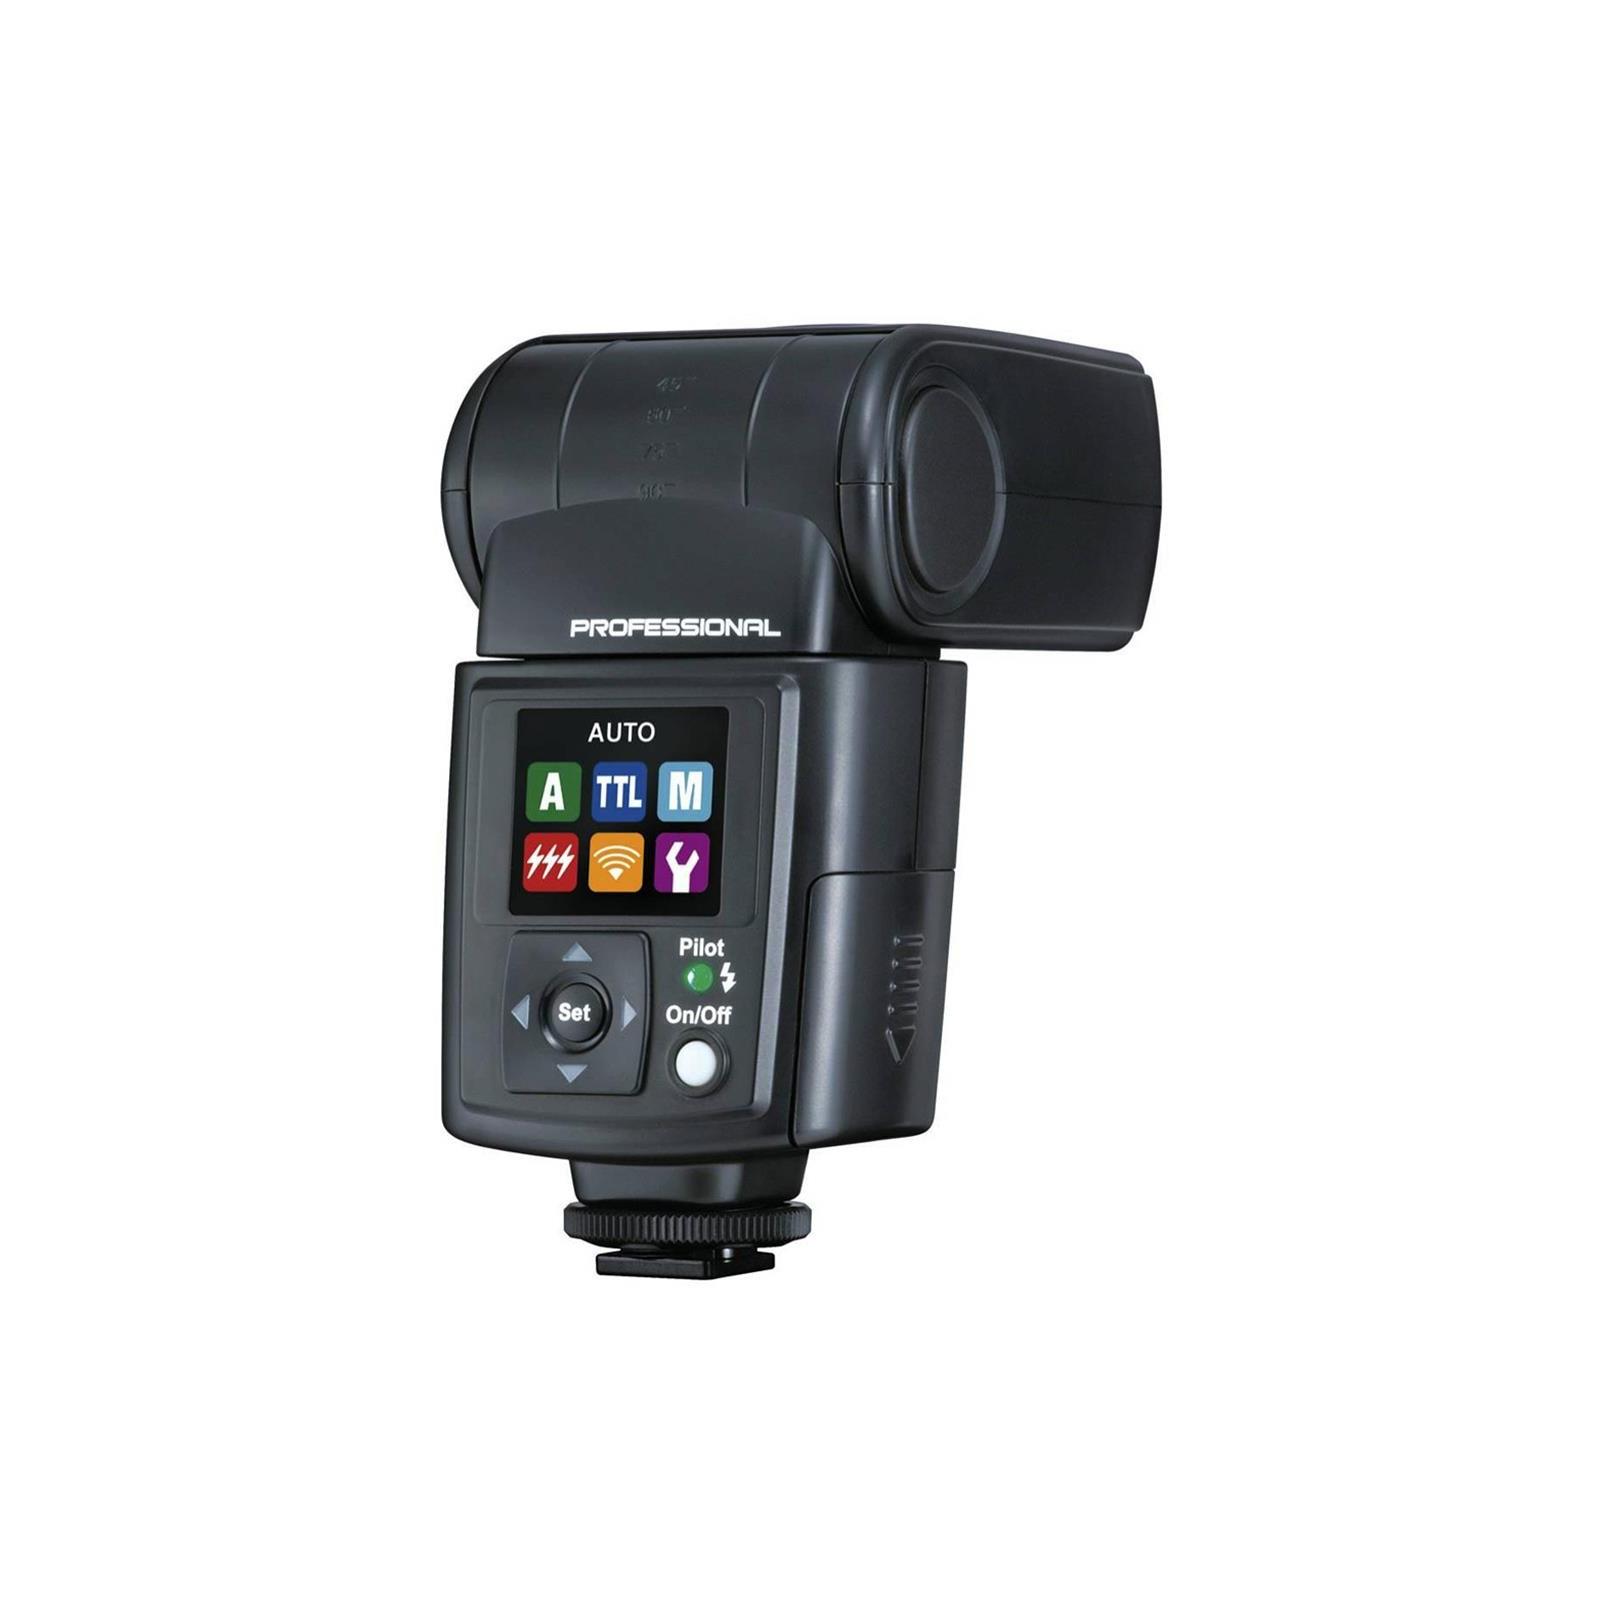 Вспышка Nissin Speedlite Di866 Mark II Canon + Powerex 2700 (NI-DI822IIC) изображение 2